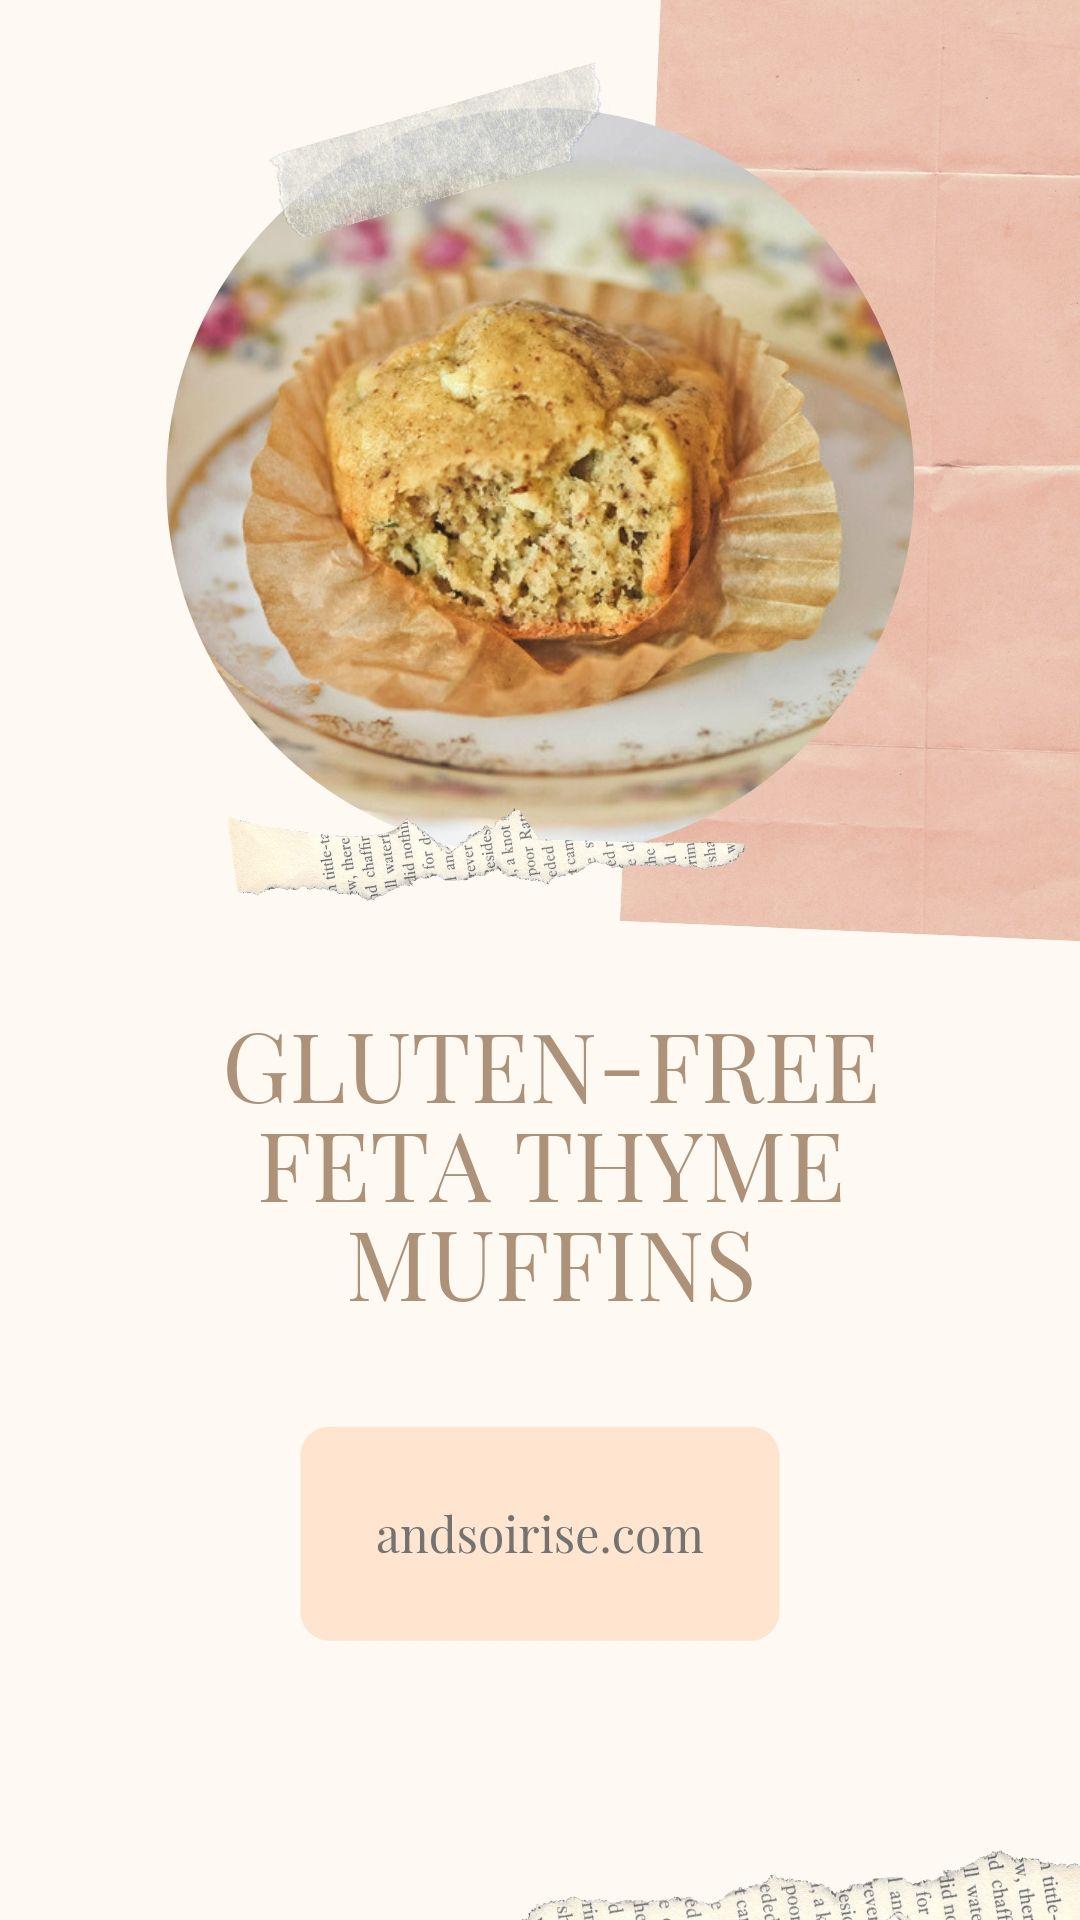 gluten-free feta thyme muffins pin.jpg